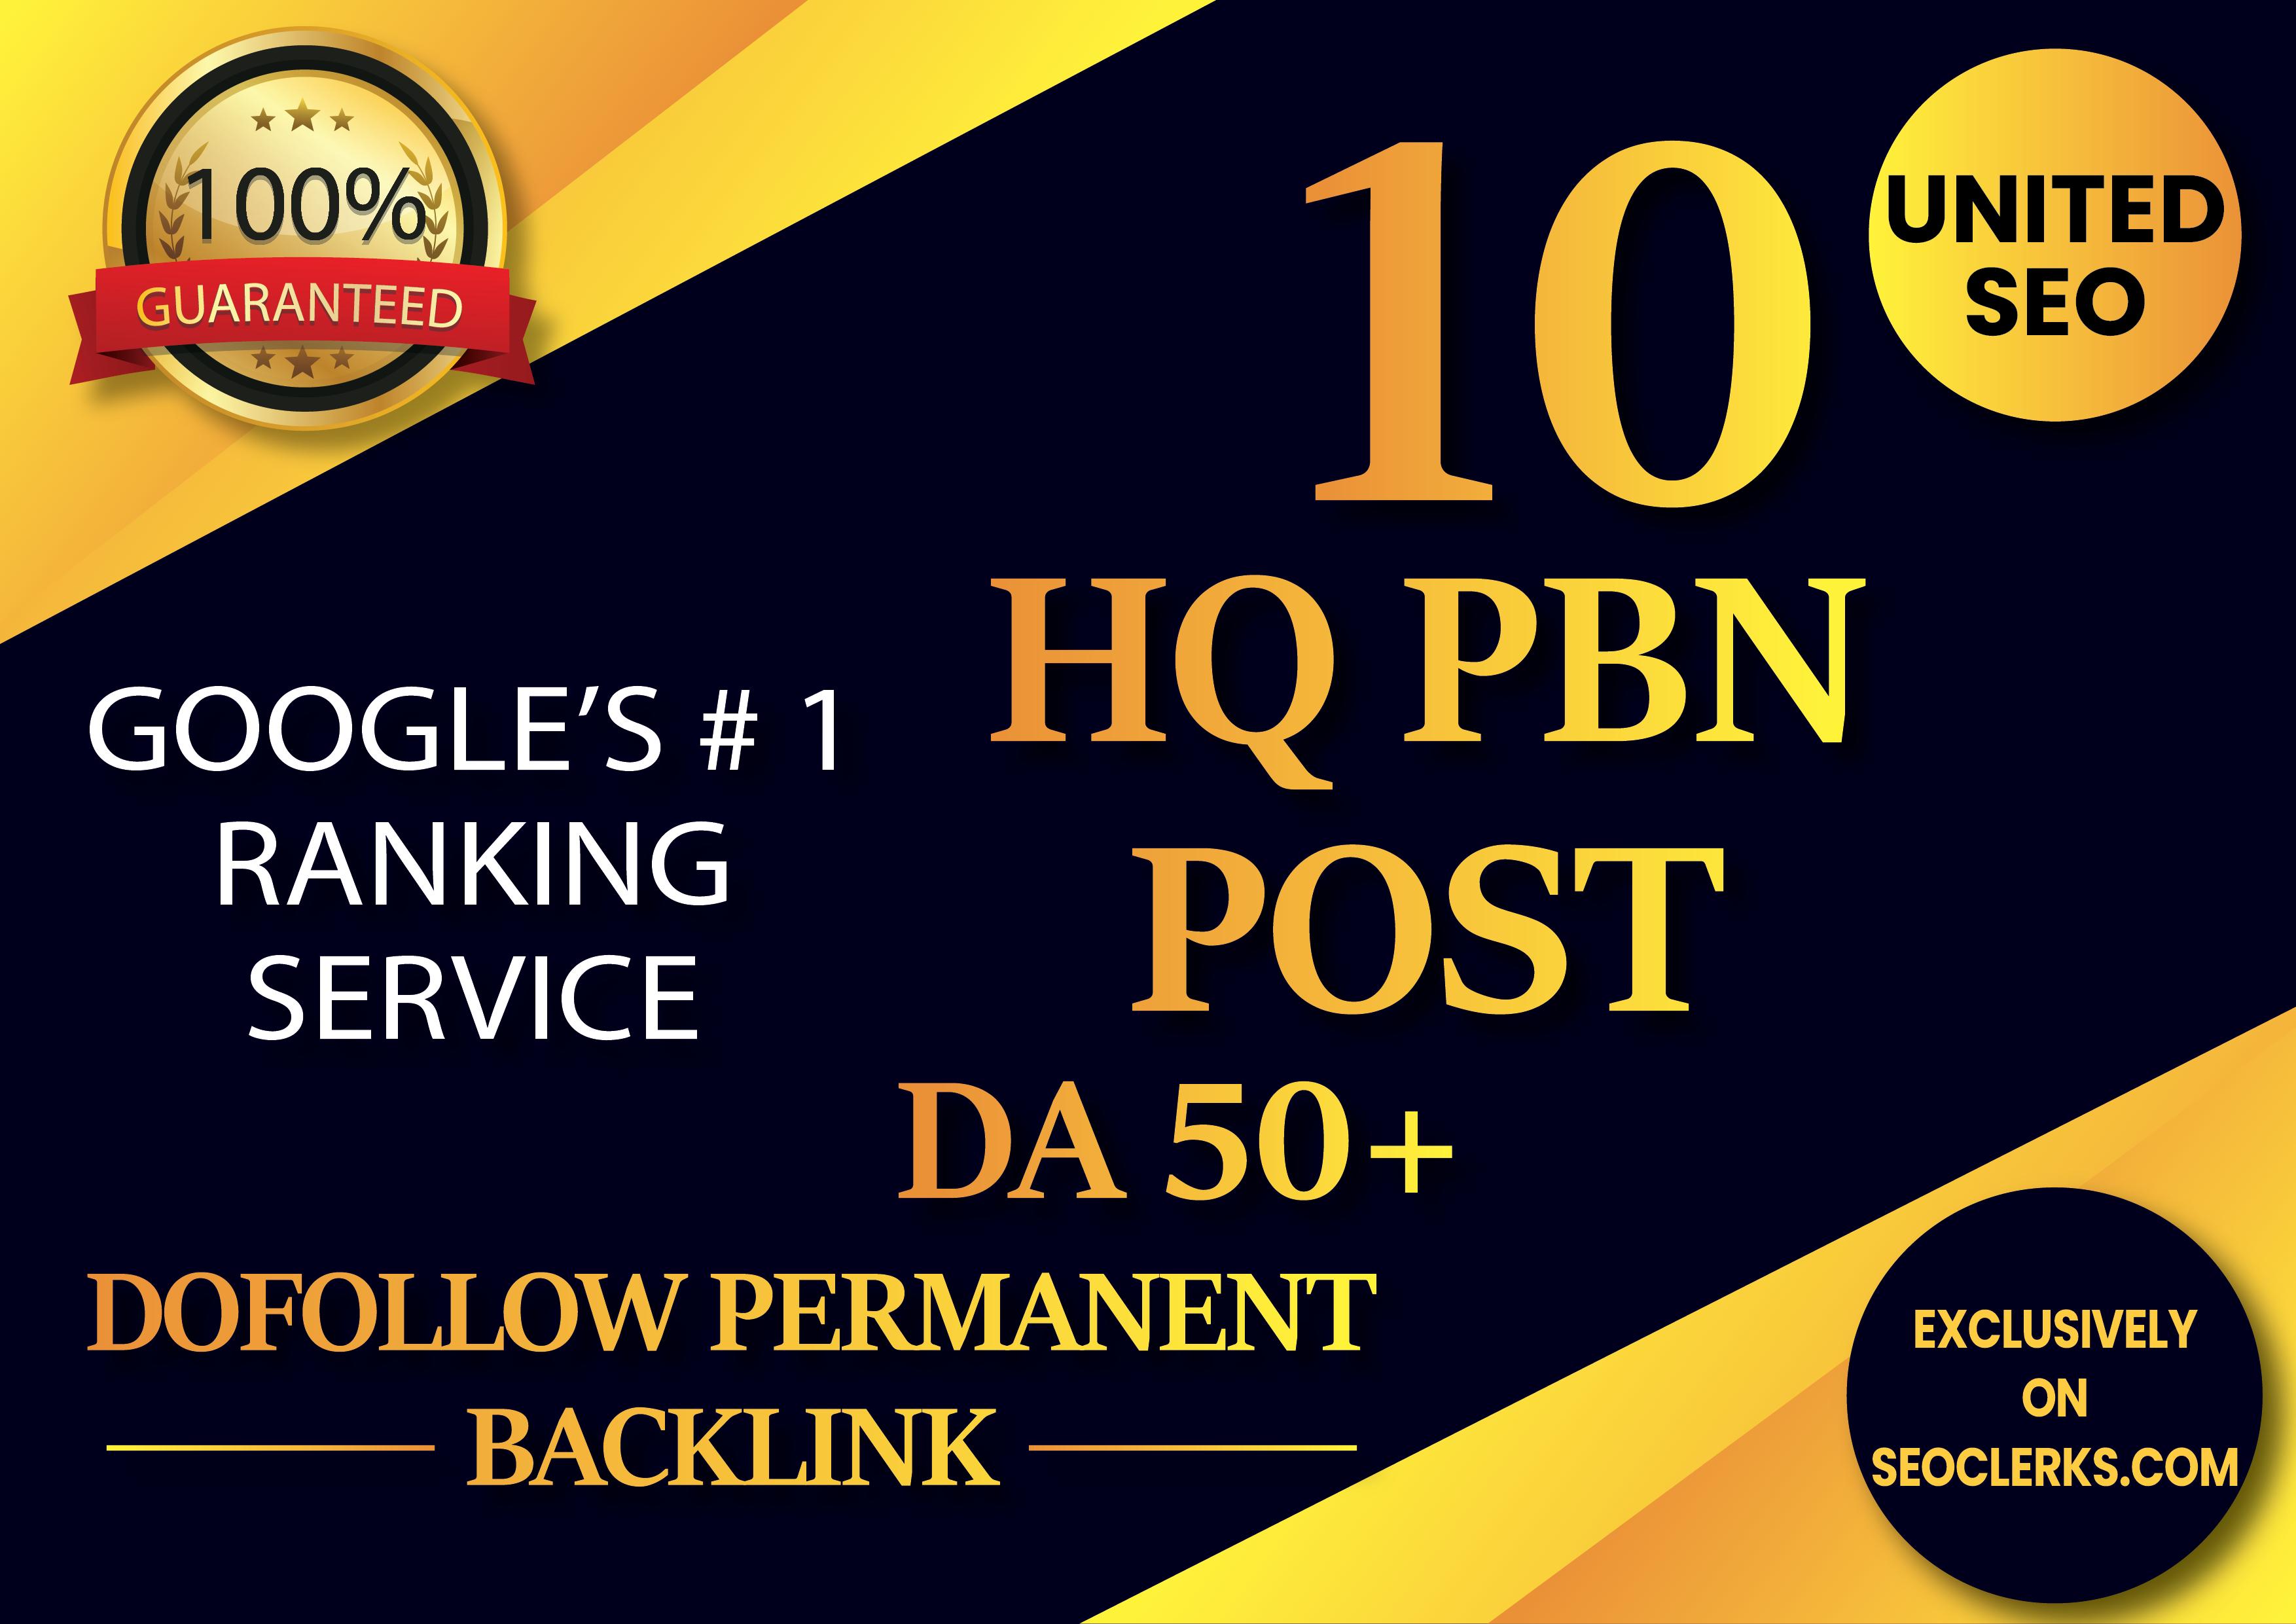 Build 10 High DA 60+ Powerfull PBN Dofollow Permanent Homepage Backlinks